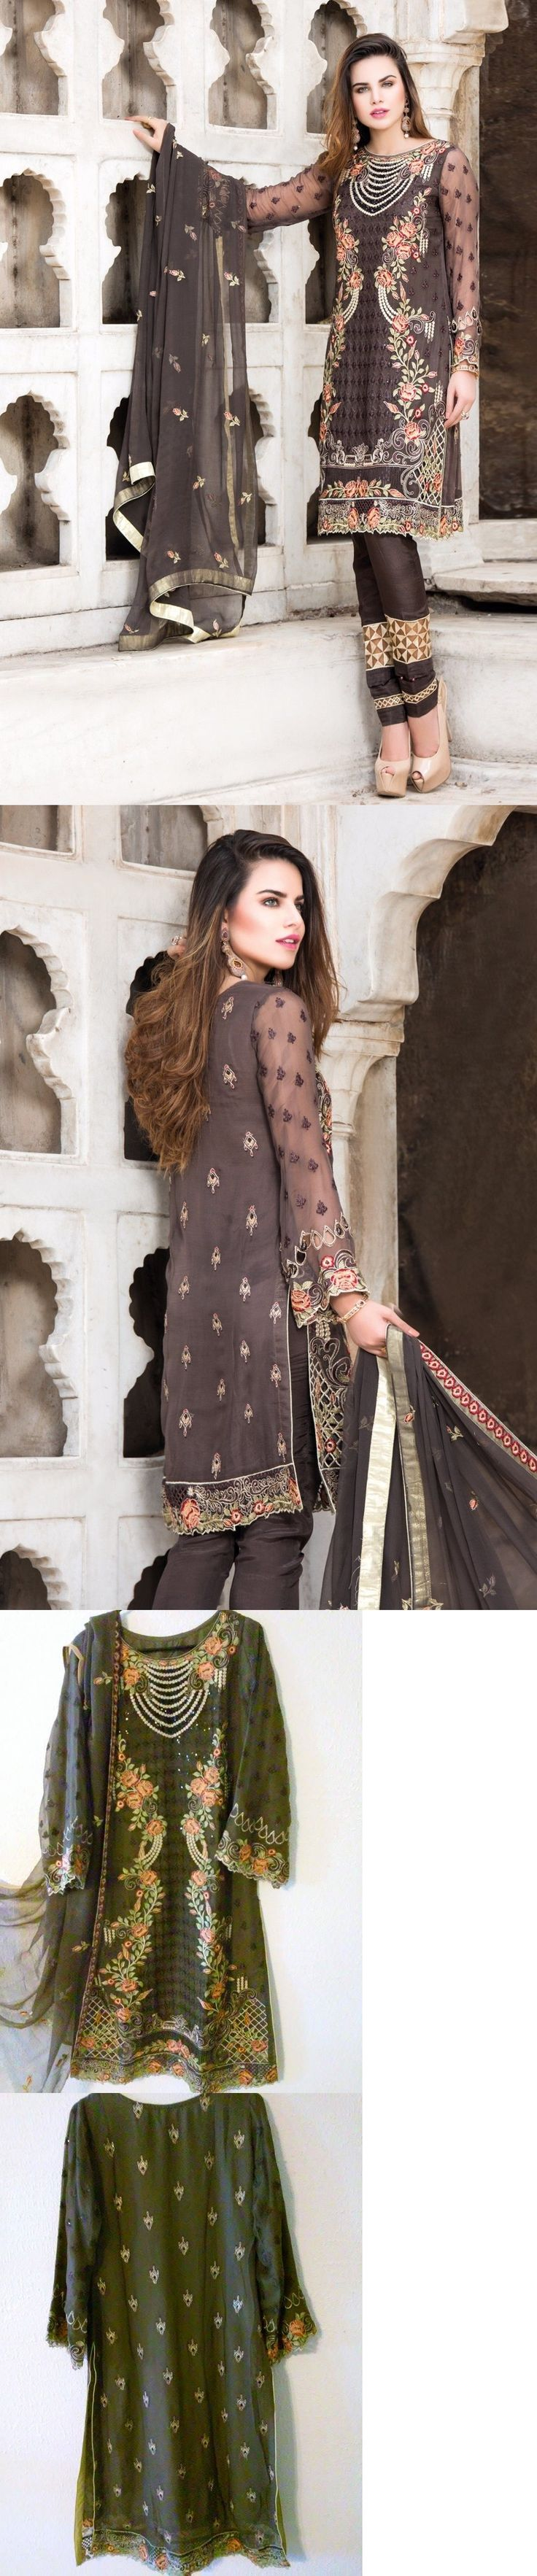 Salwar Kameez 155249: Pakistani Designer Chiffon Stylish Embroidered Outfit Shalwar Kameez Sz S M New -> BUY IT NOW ONLY: $95 on eBay!